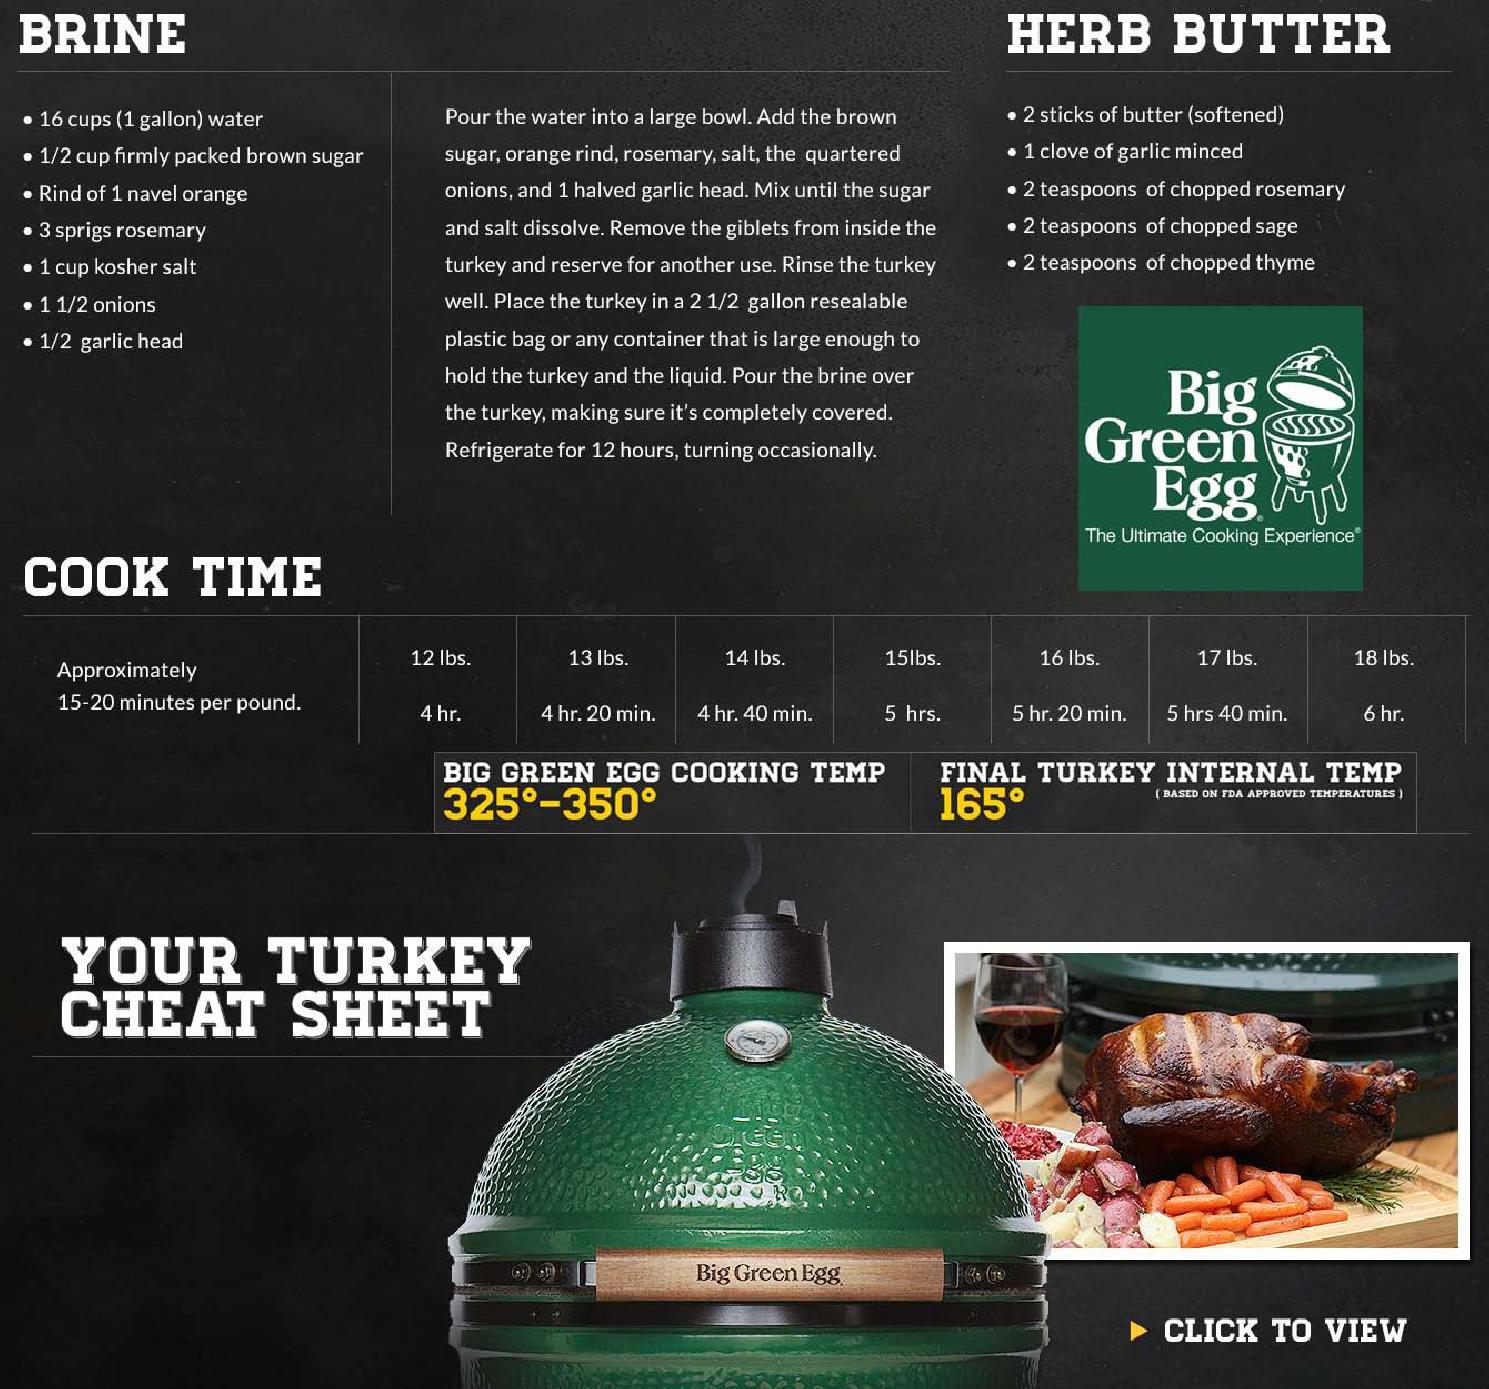 Big Green Egg Thanksgiving Turkey  Big Green Egg Thanksgiving Turkey Cheat Sheet by Big Green